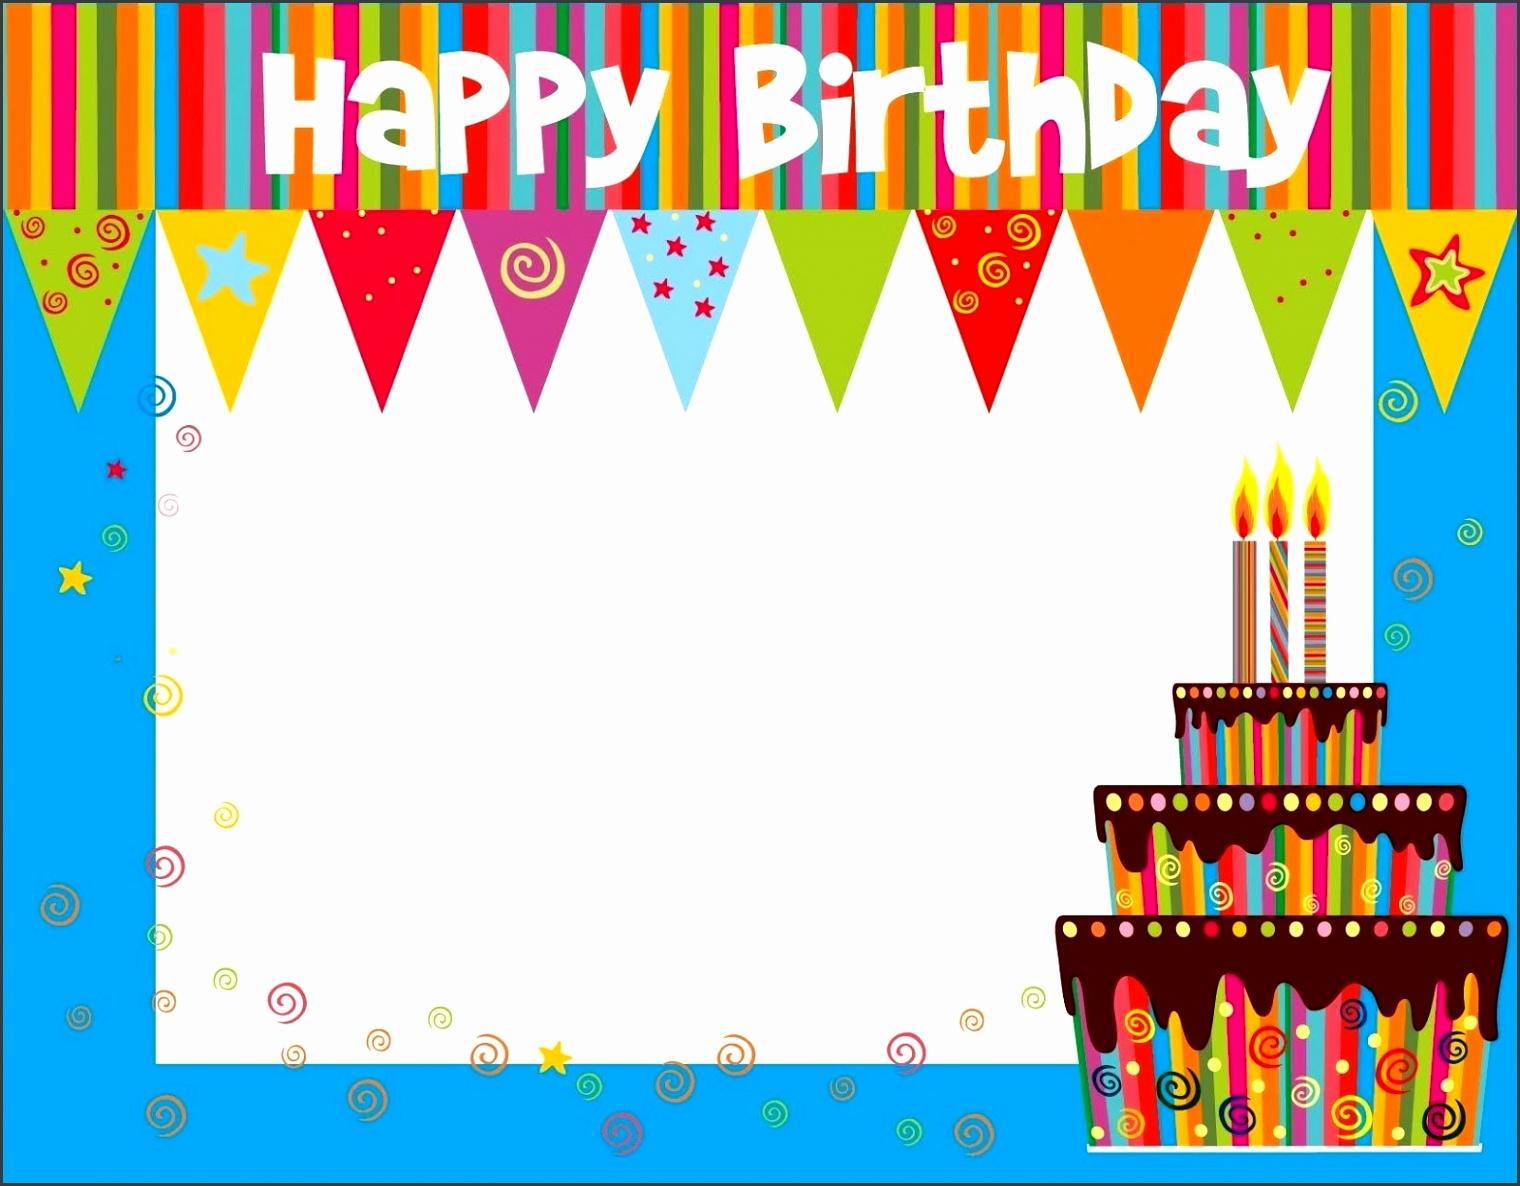 Printable Birthday Card Designs Gseokbinder for Birthday Card Template Boy 1453